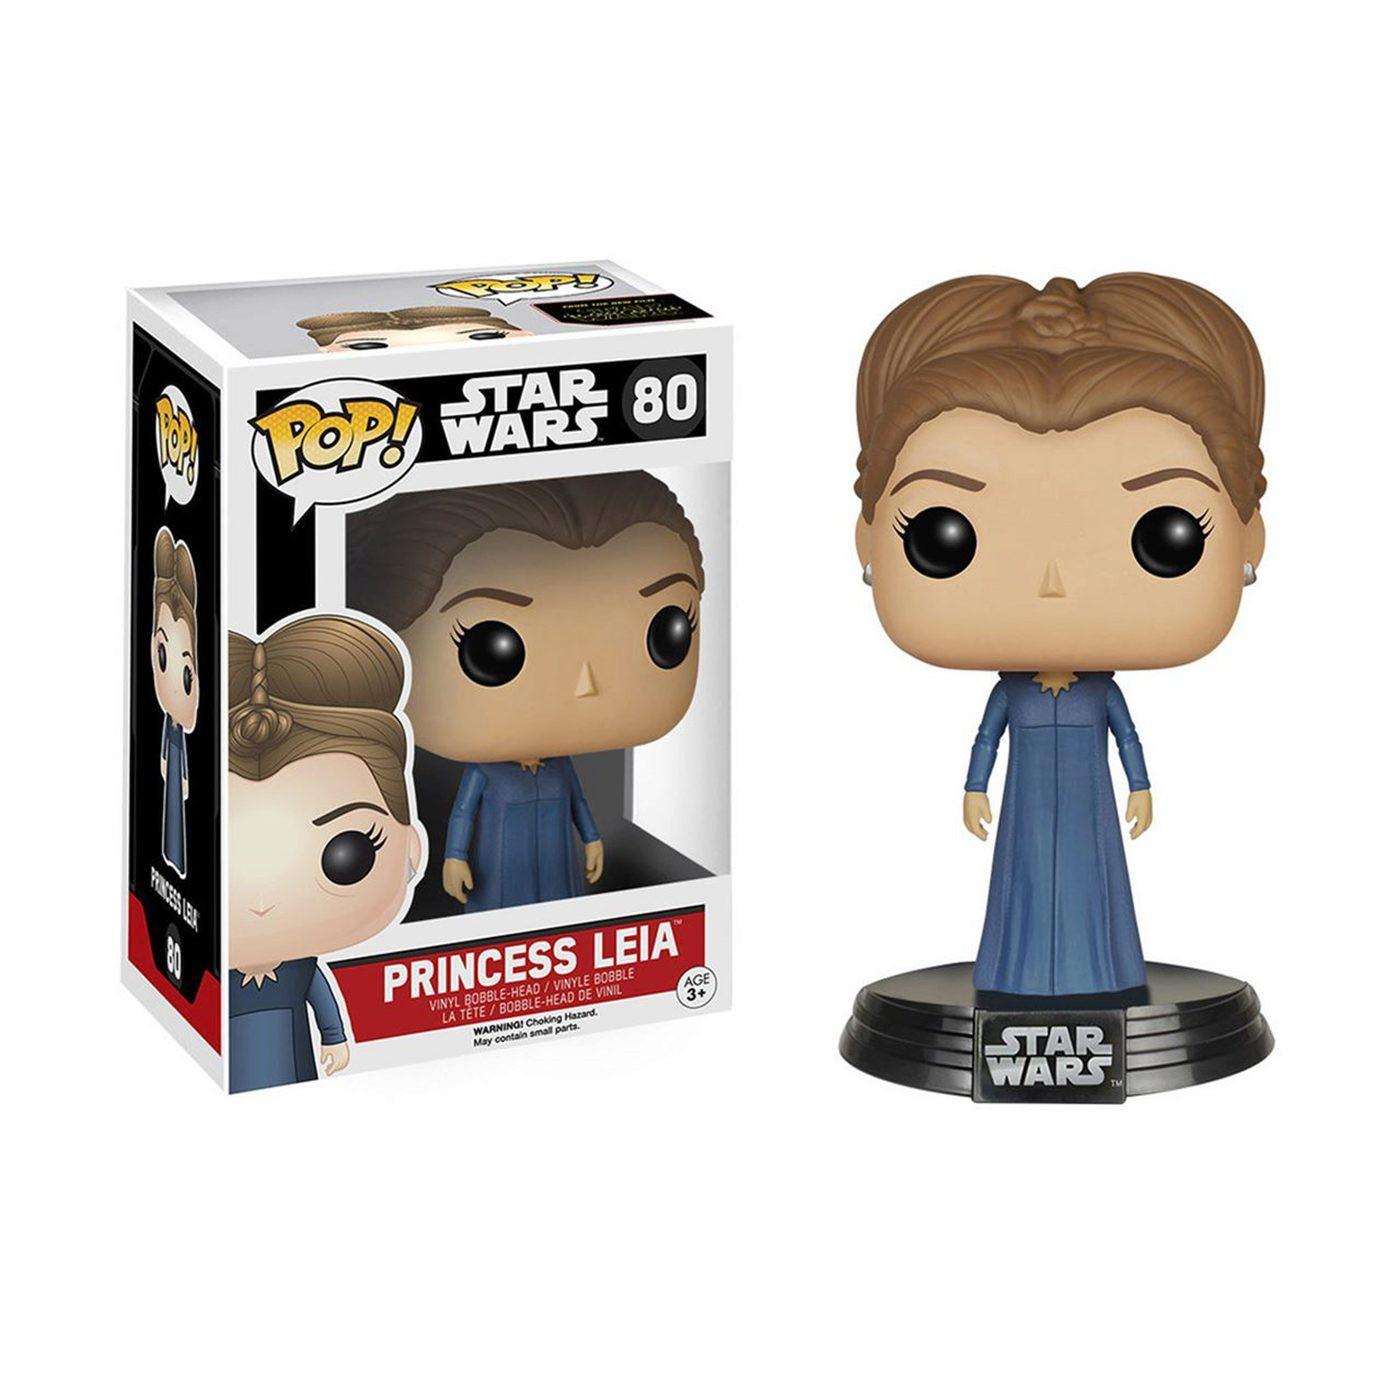 Star Wars The Force Awakens Leia Pop Bobblehead